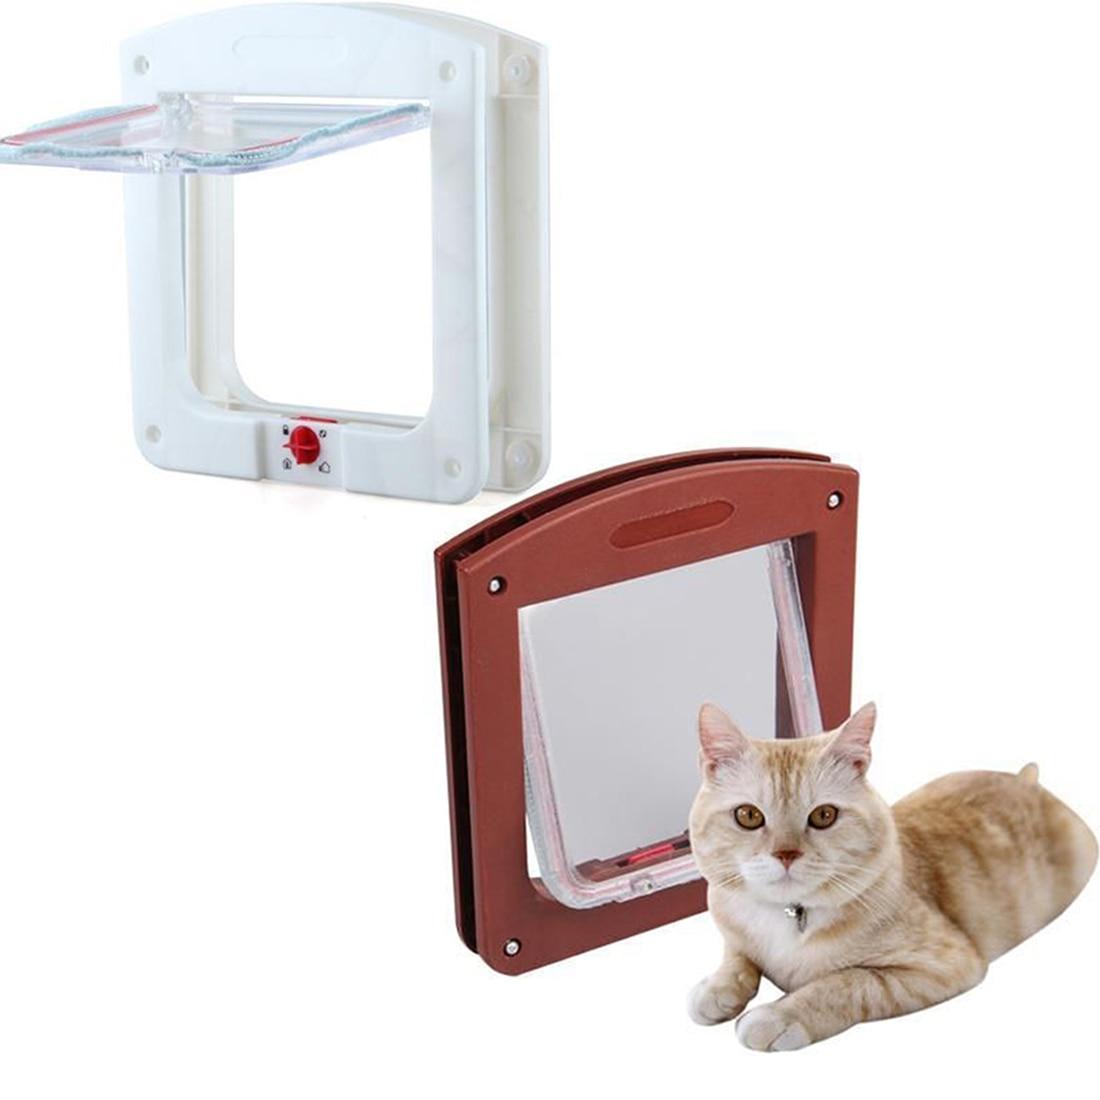 Hotsale Plastic 4 Way Cat Dog Small Pet Locking Door Flap Waterproof  Durable